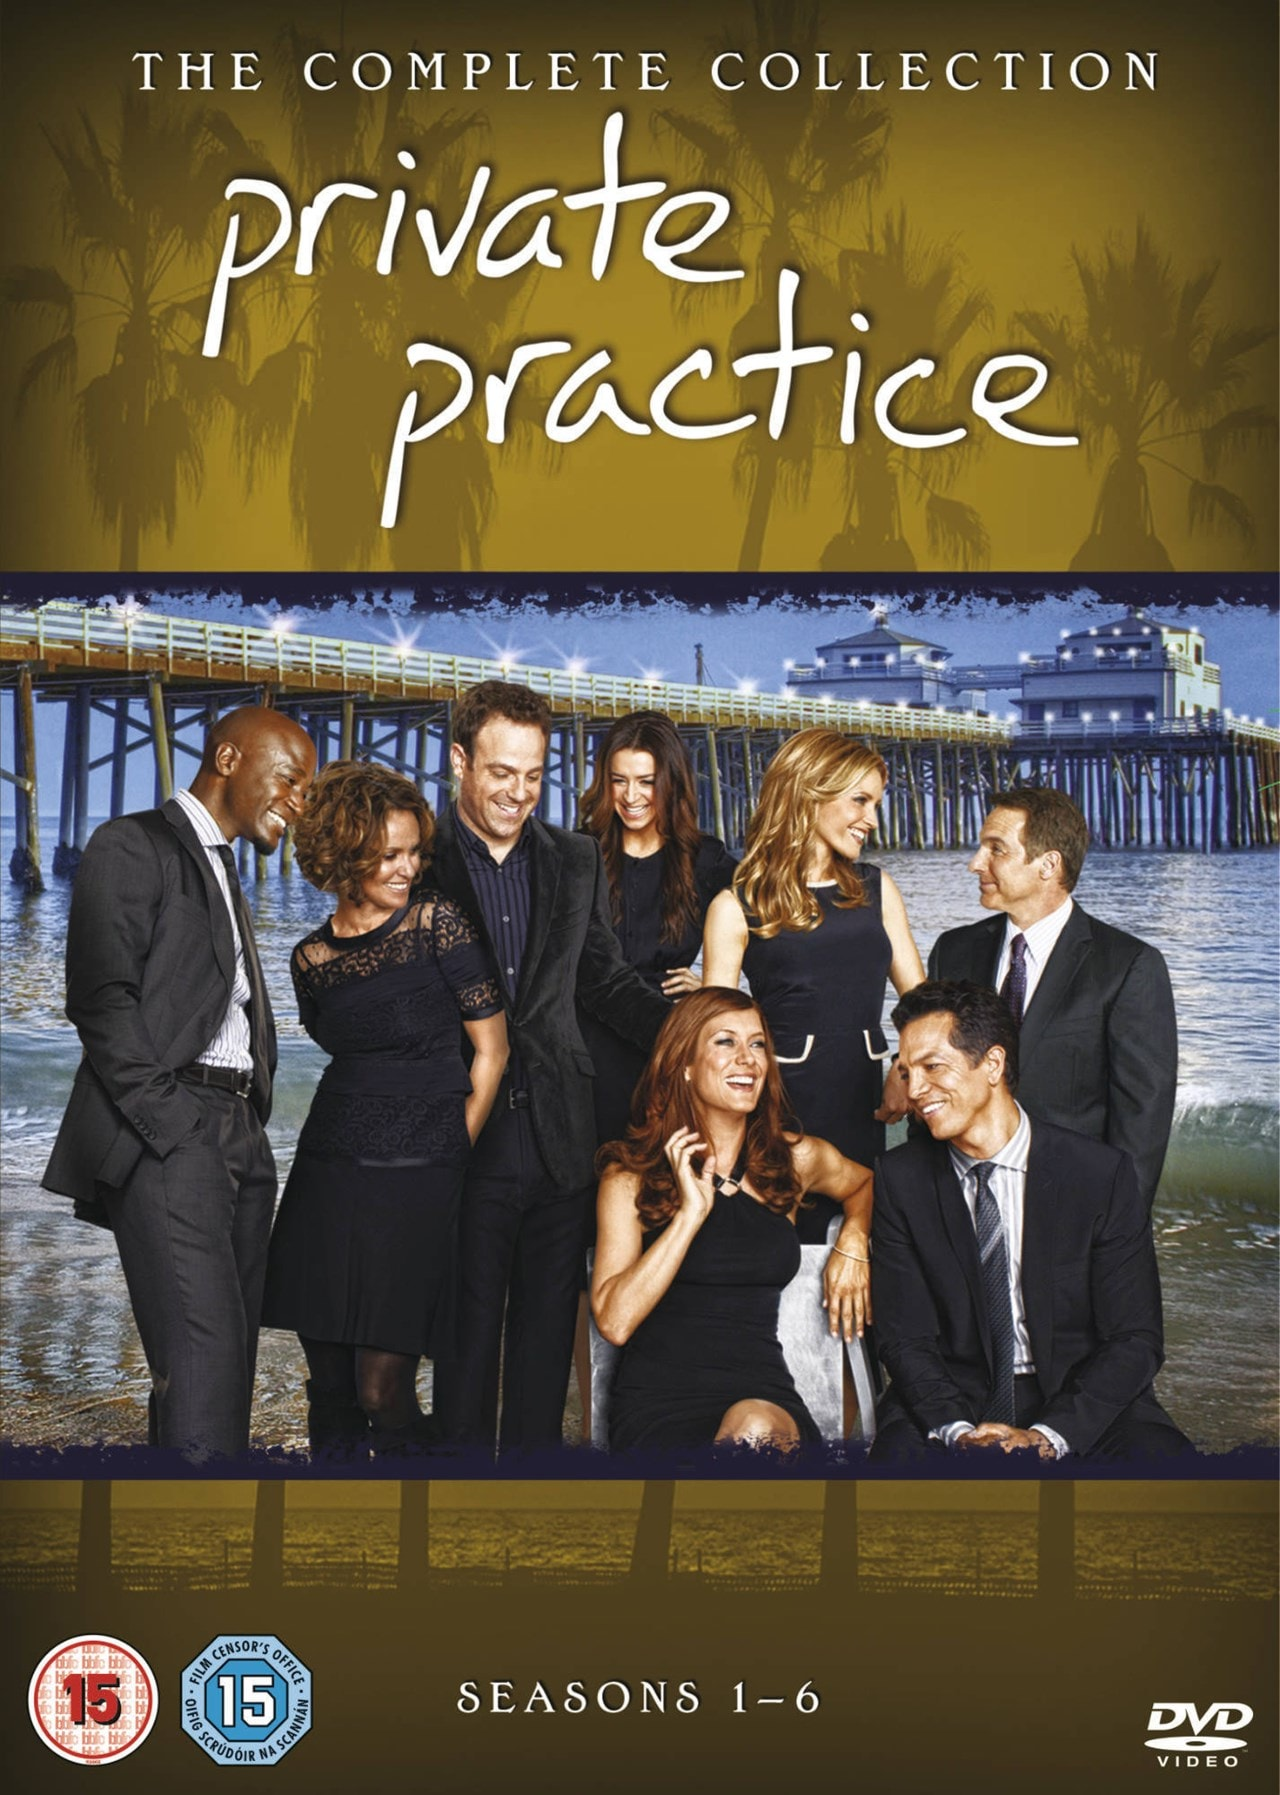 Private Practice: Seasons 1-6 - 1